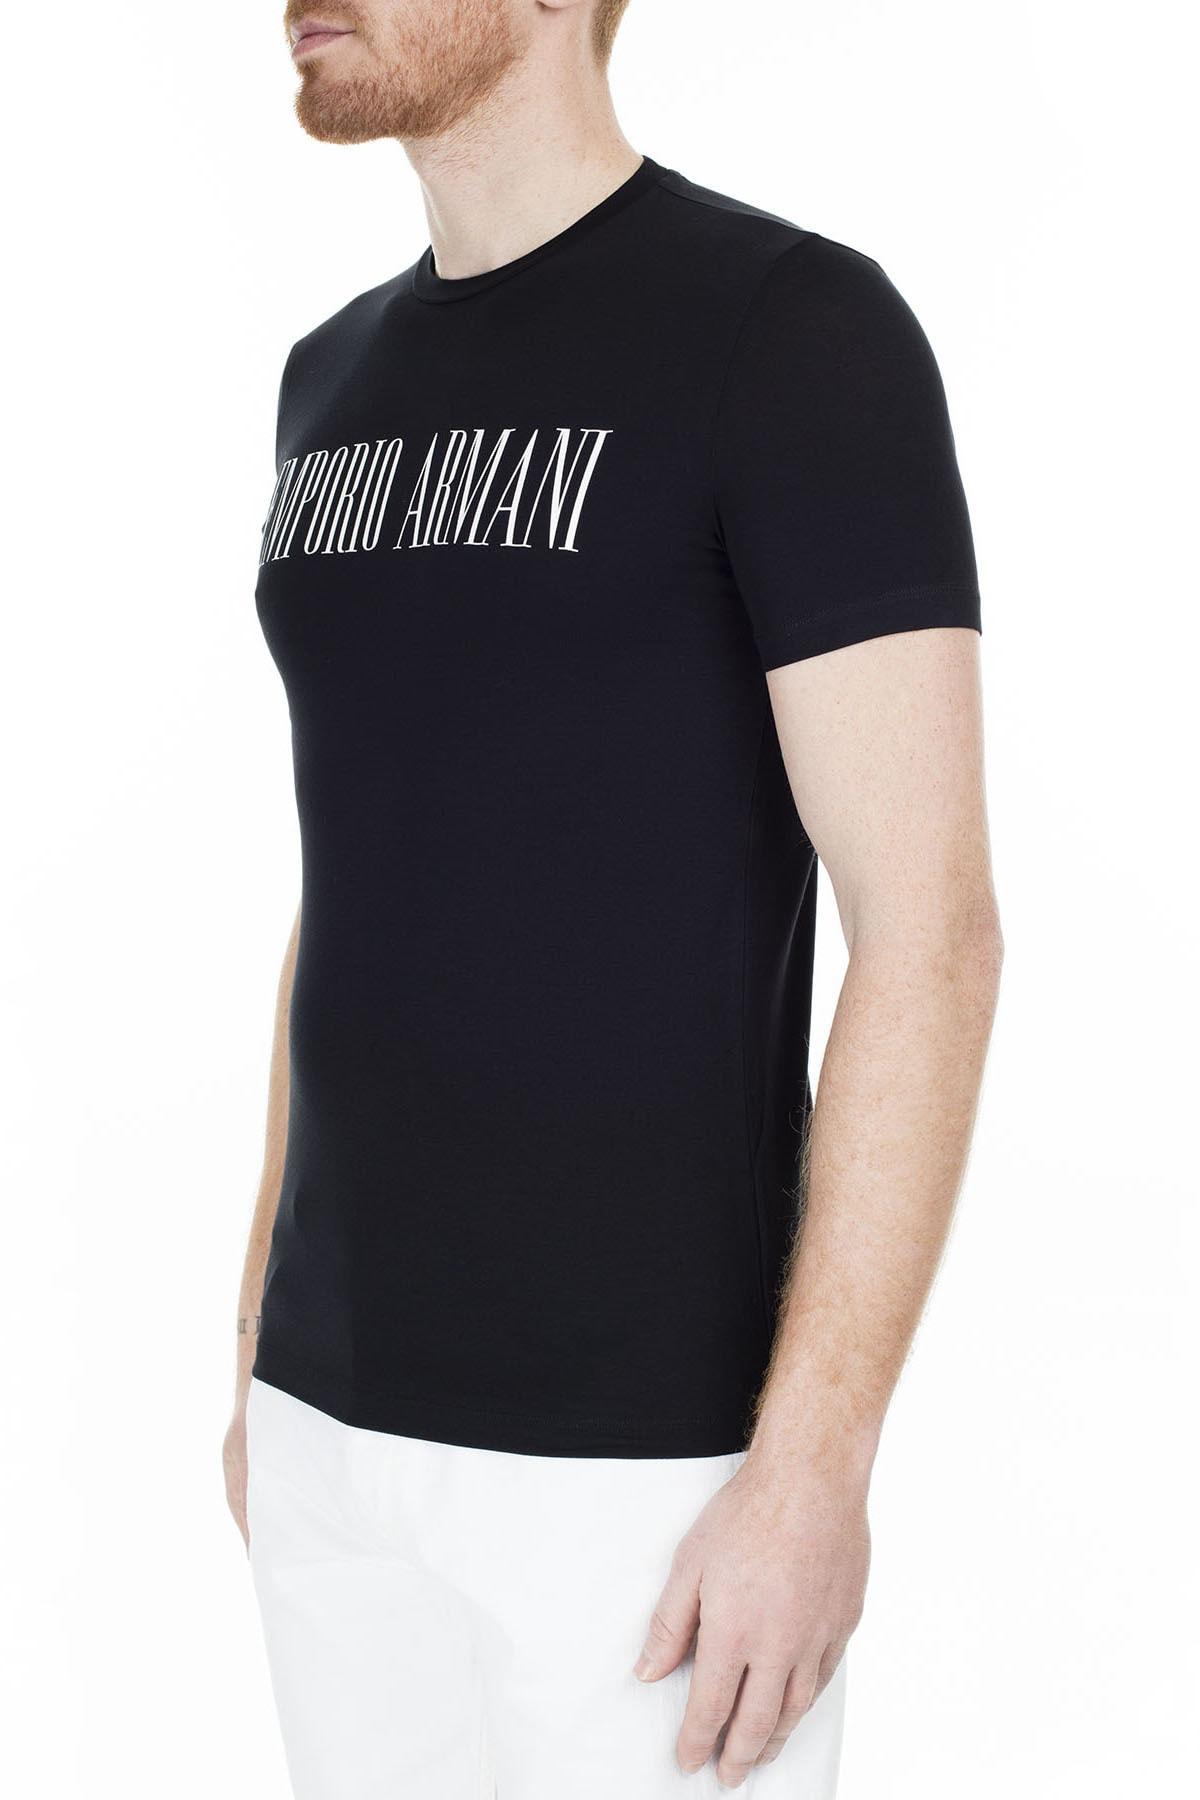 Emporio Armani Regular Fit T Shirt Erkek T Shirt S 6G1Td5 1J0Az 0002 S 6G1TD5 1J0AZ 0002 2